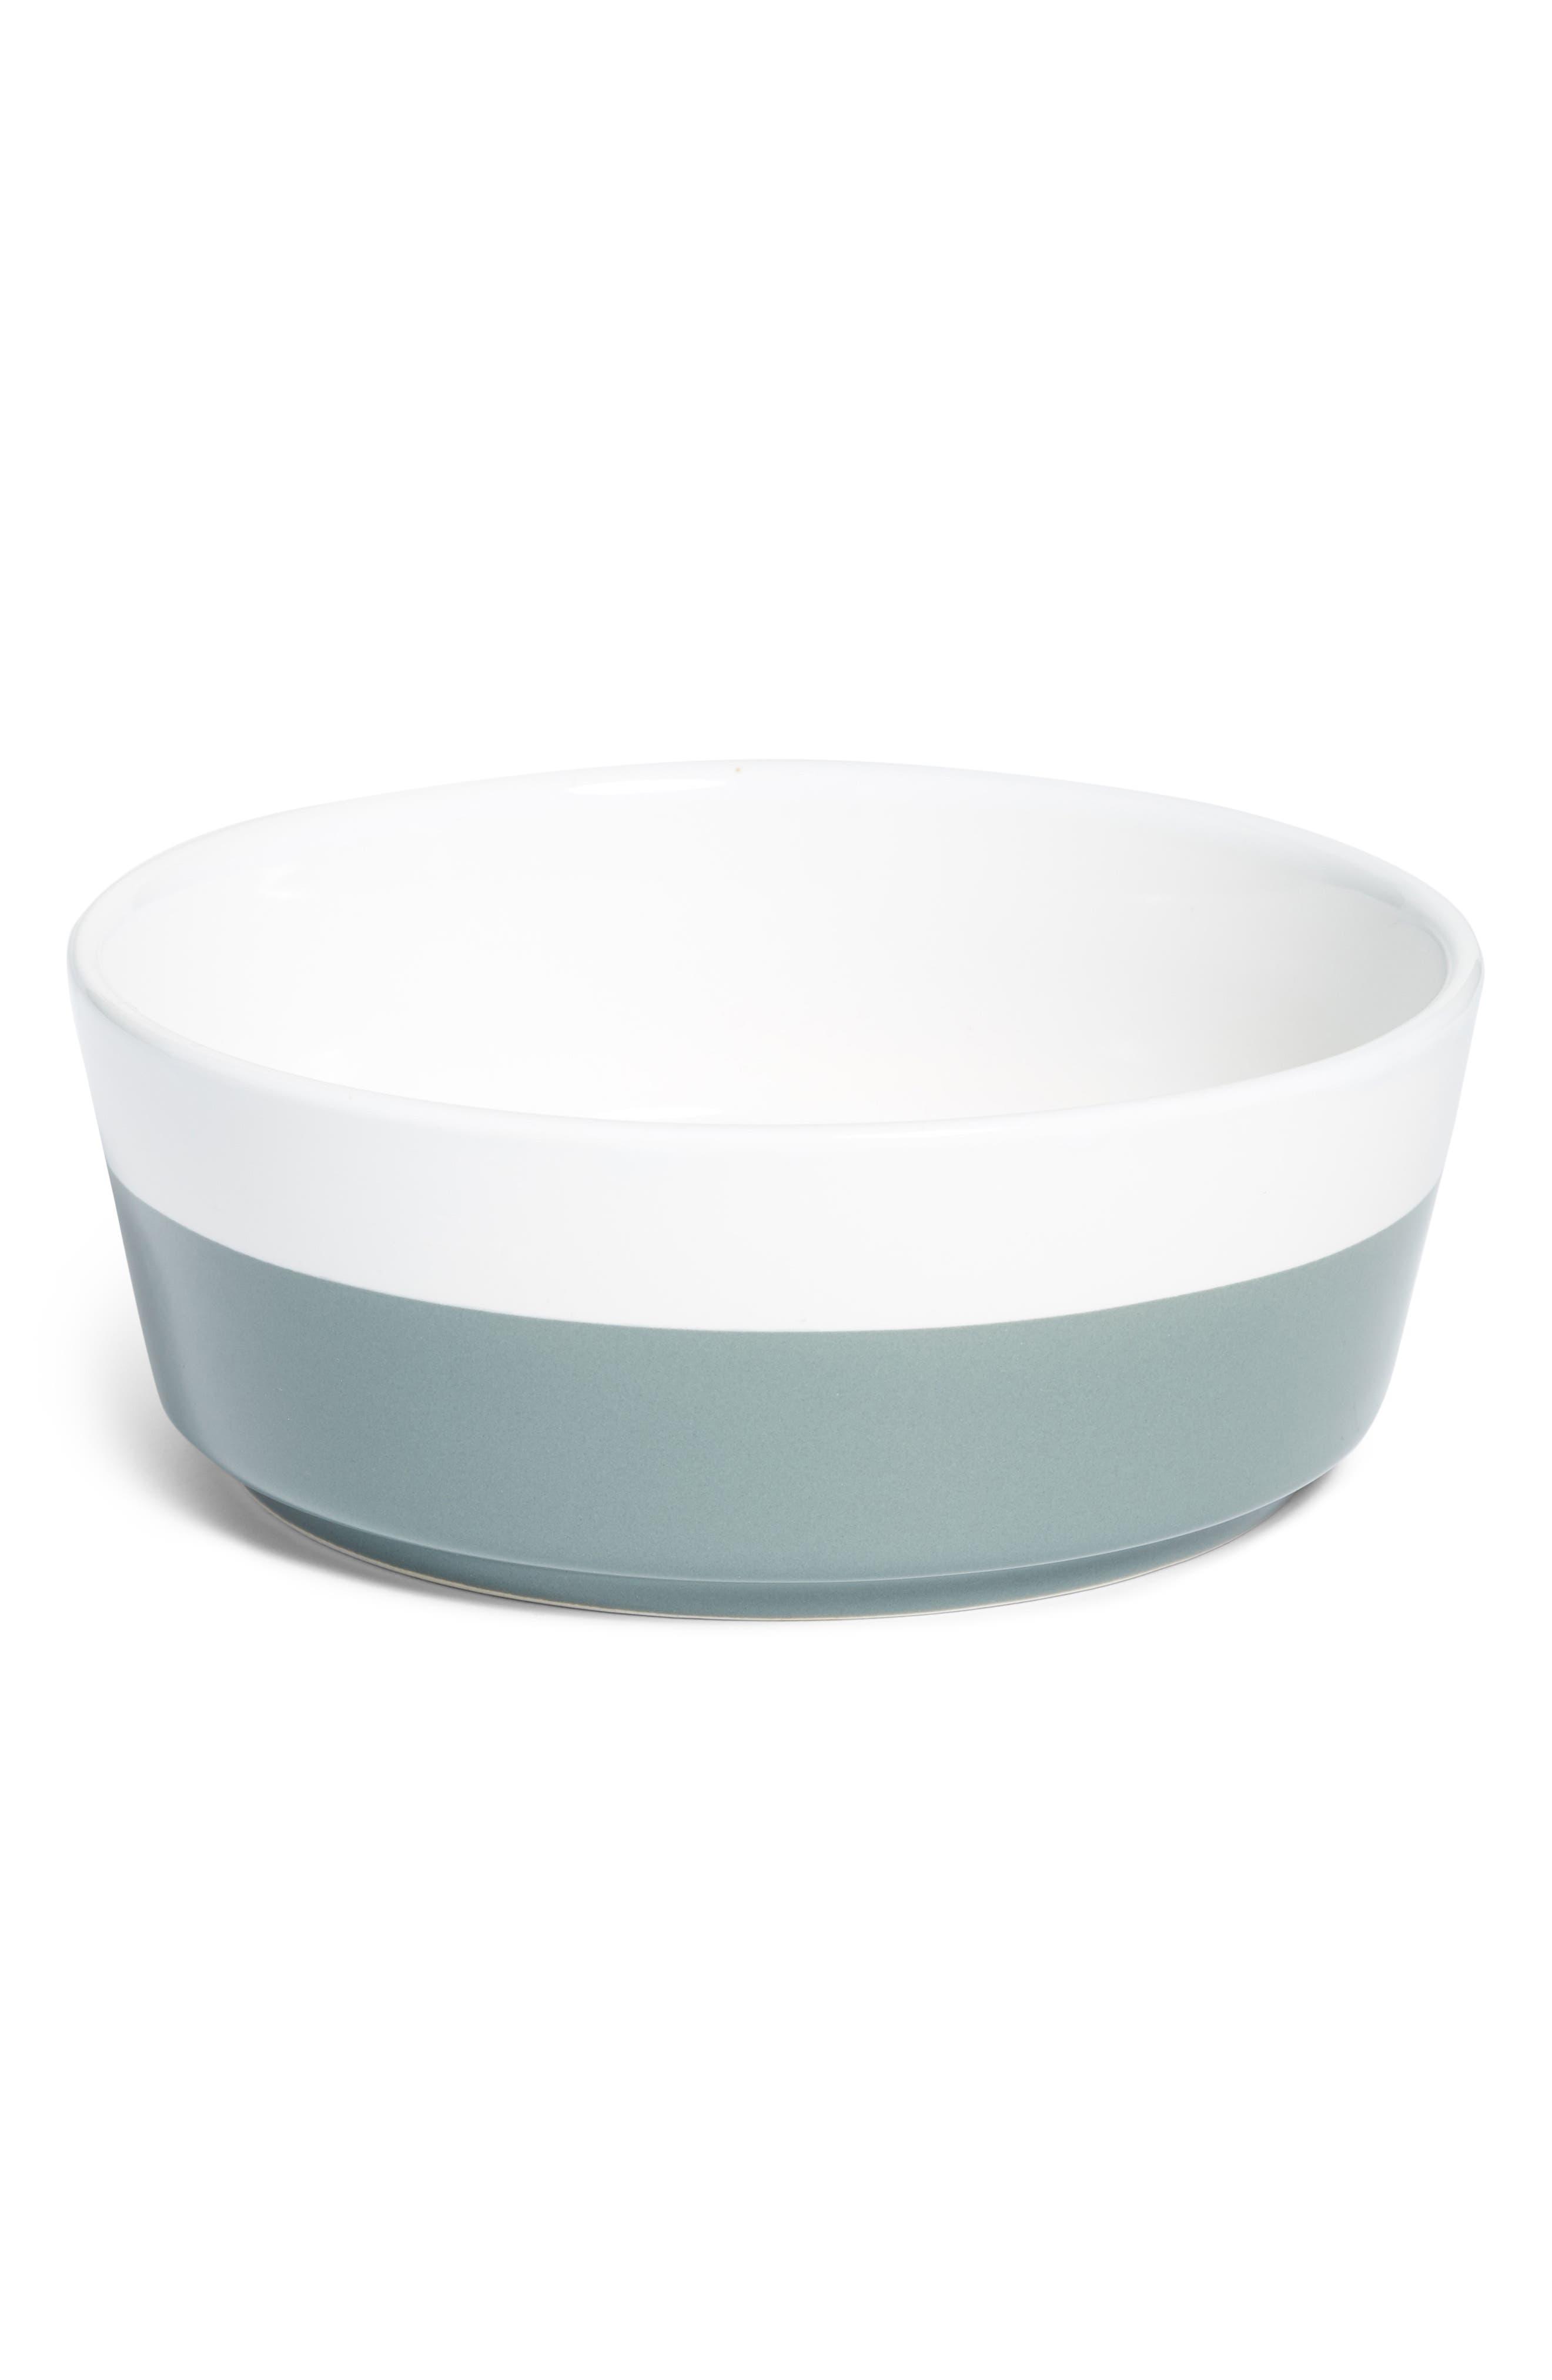 Dipper Ceramic Dog Bowl,                             Main thumbnail 1, color,                             020